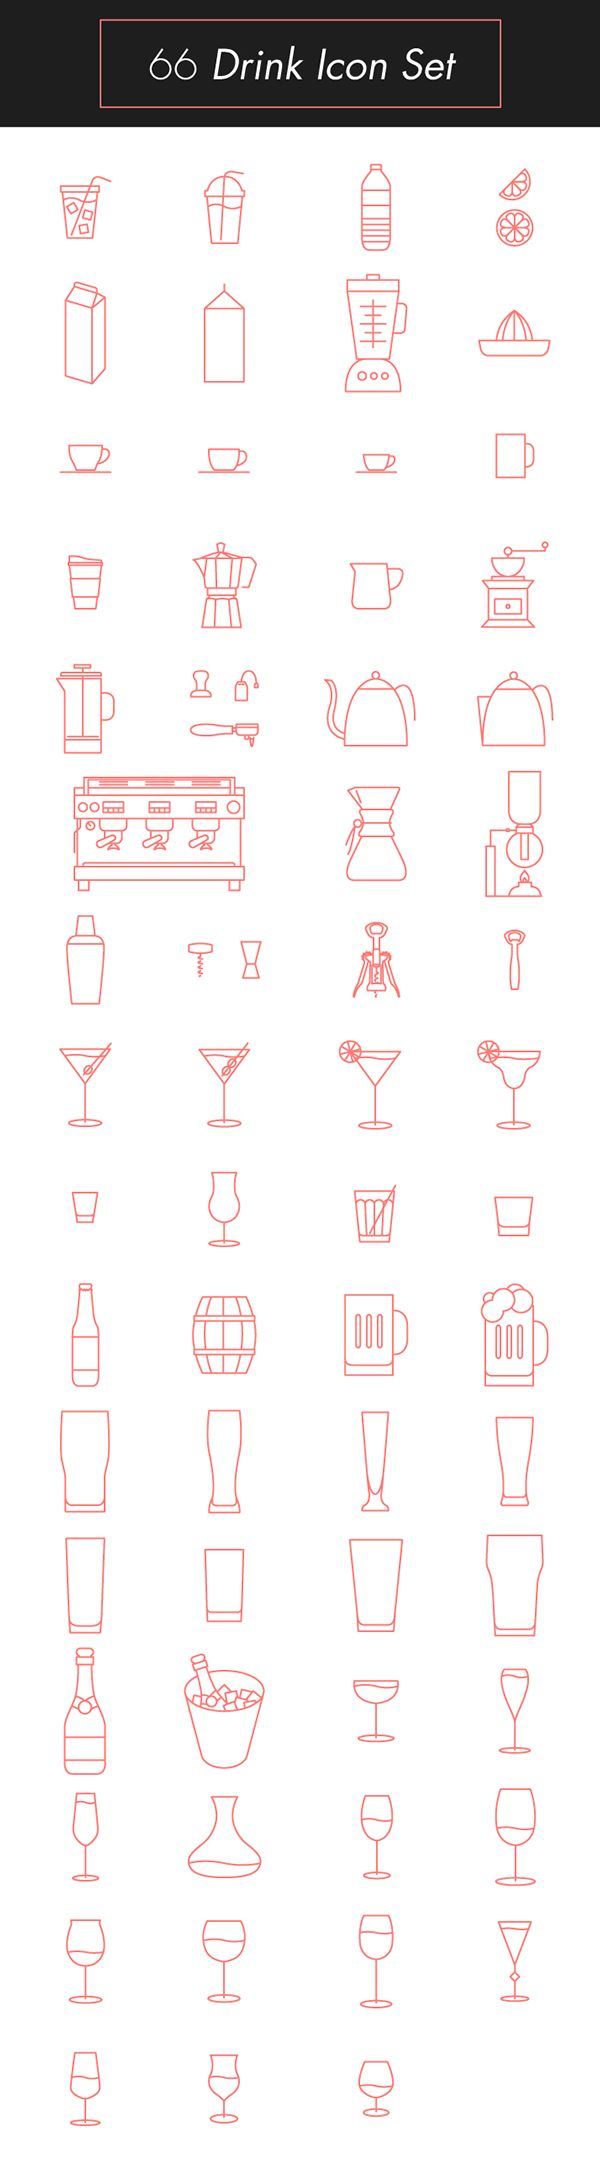 Drink Icon Set on Behance